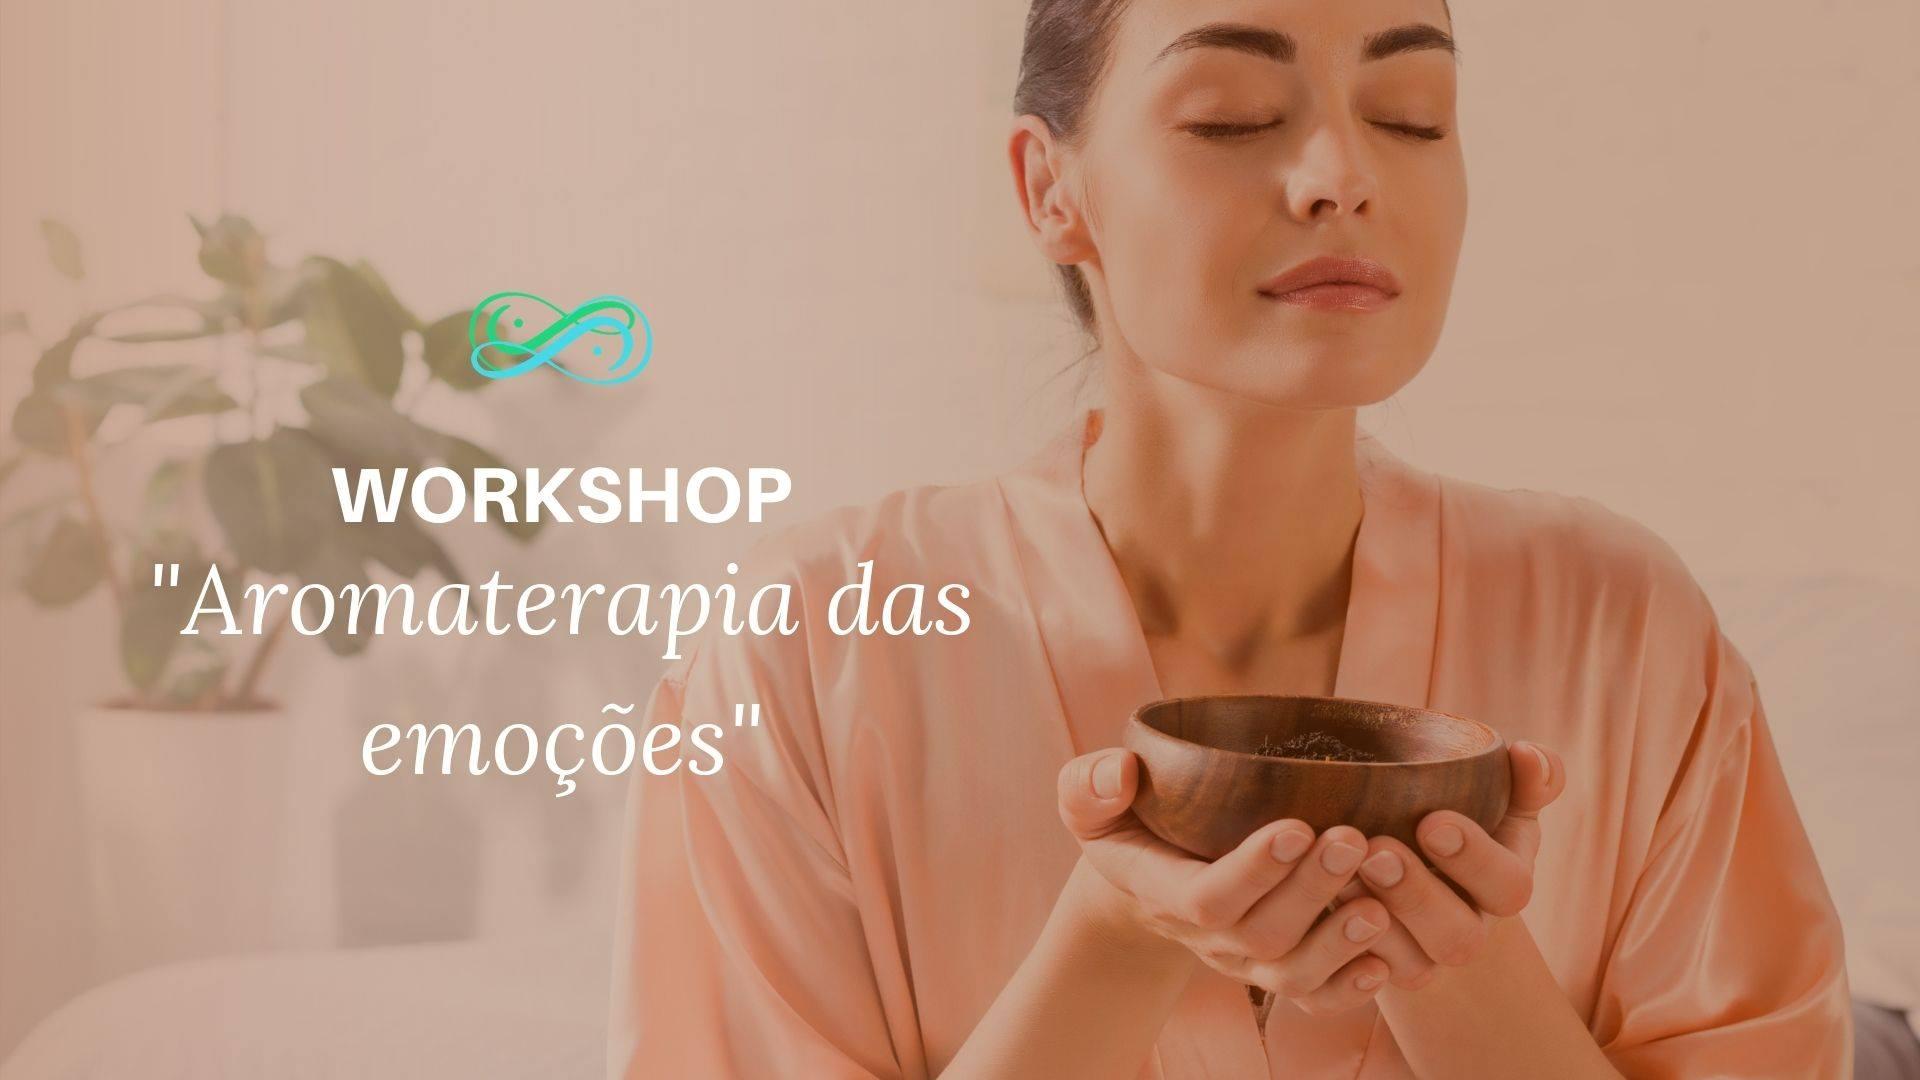 workshop aromaterapia das emoções